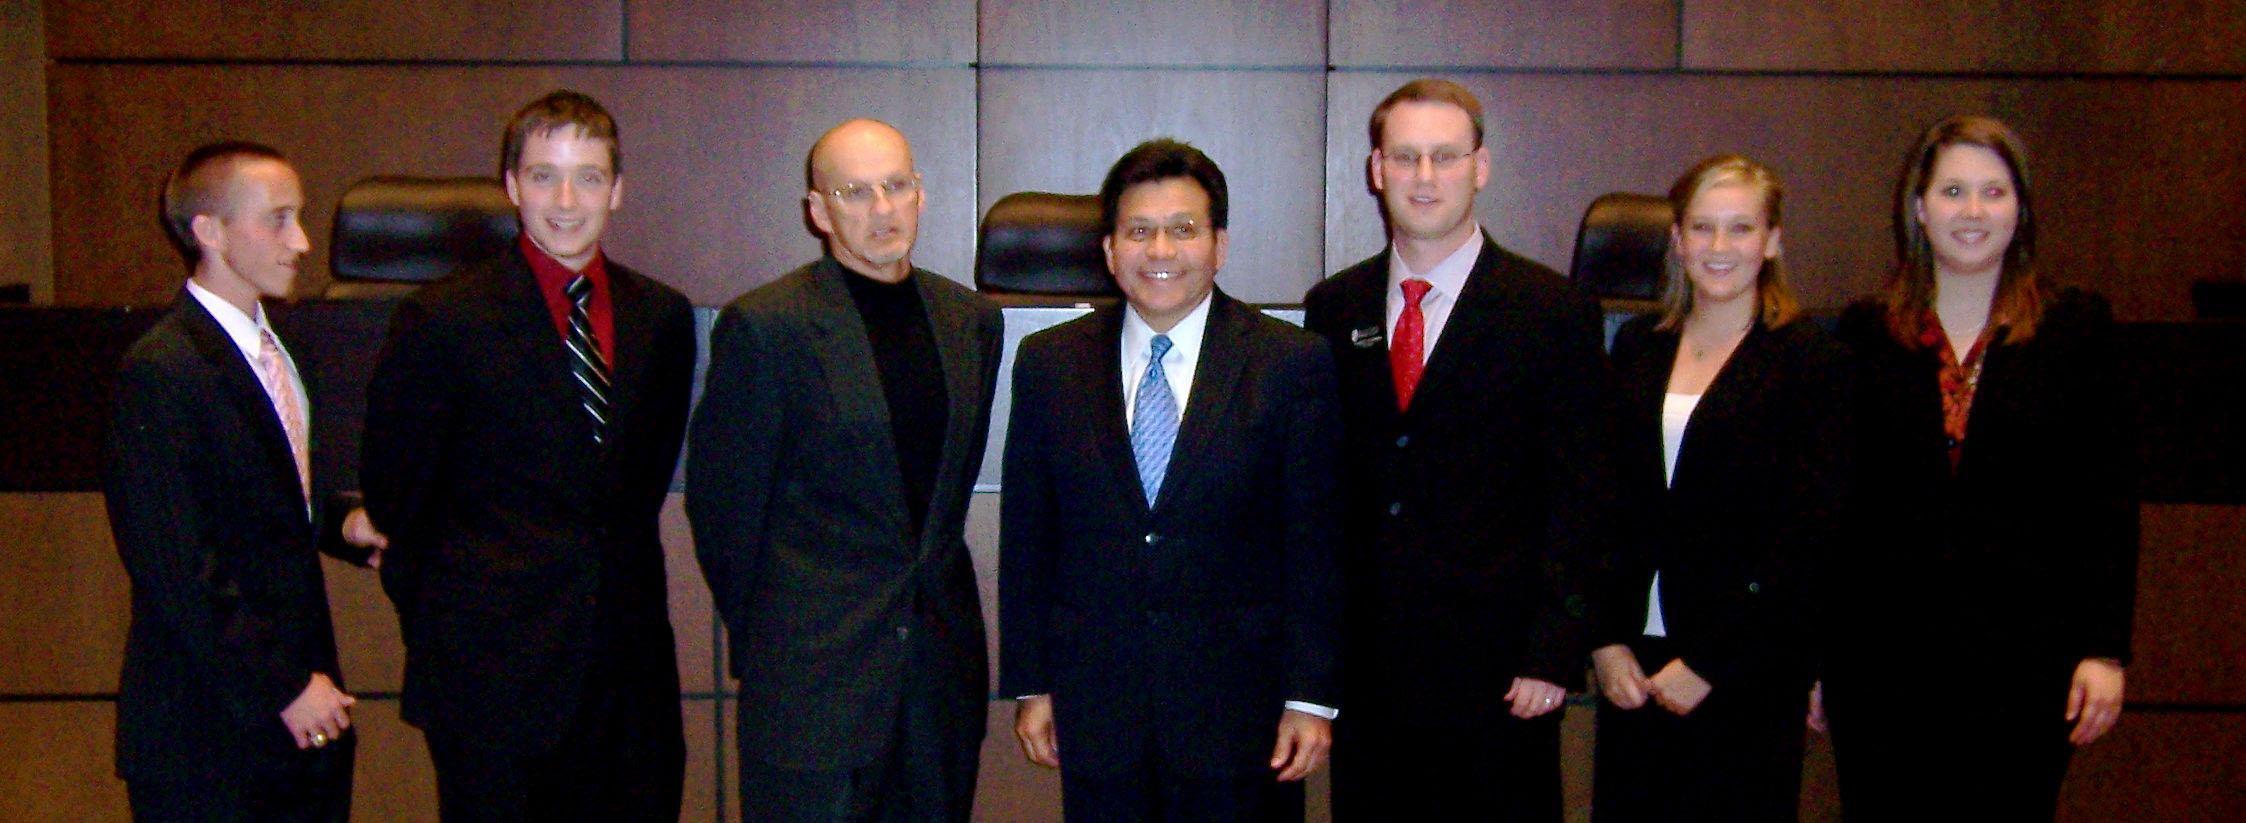 Moot Court_Texas Tech 2009 with Alberto Gonzalez